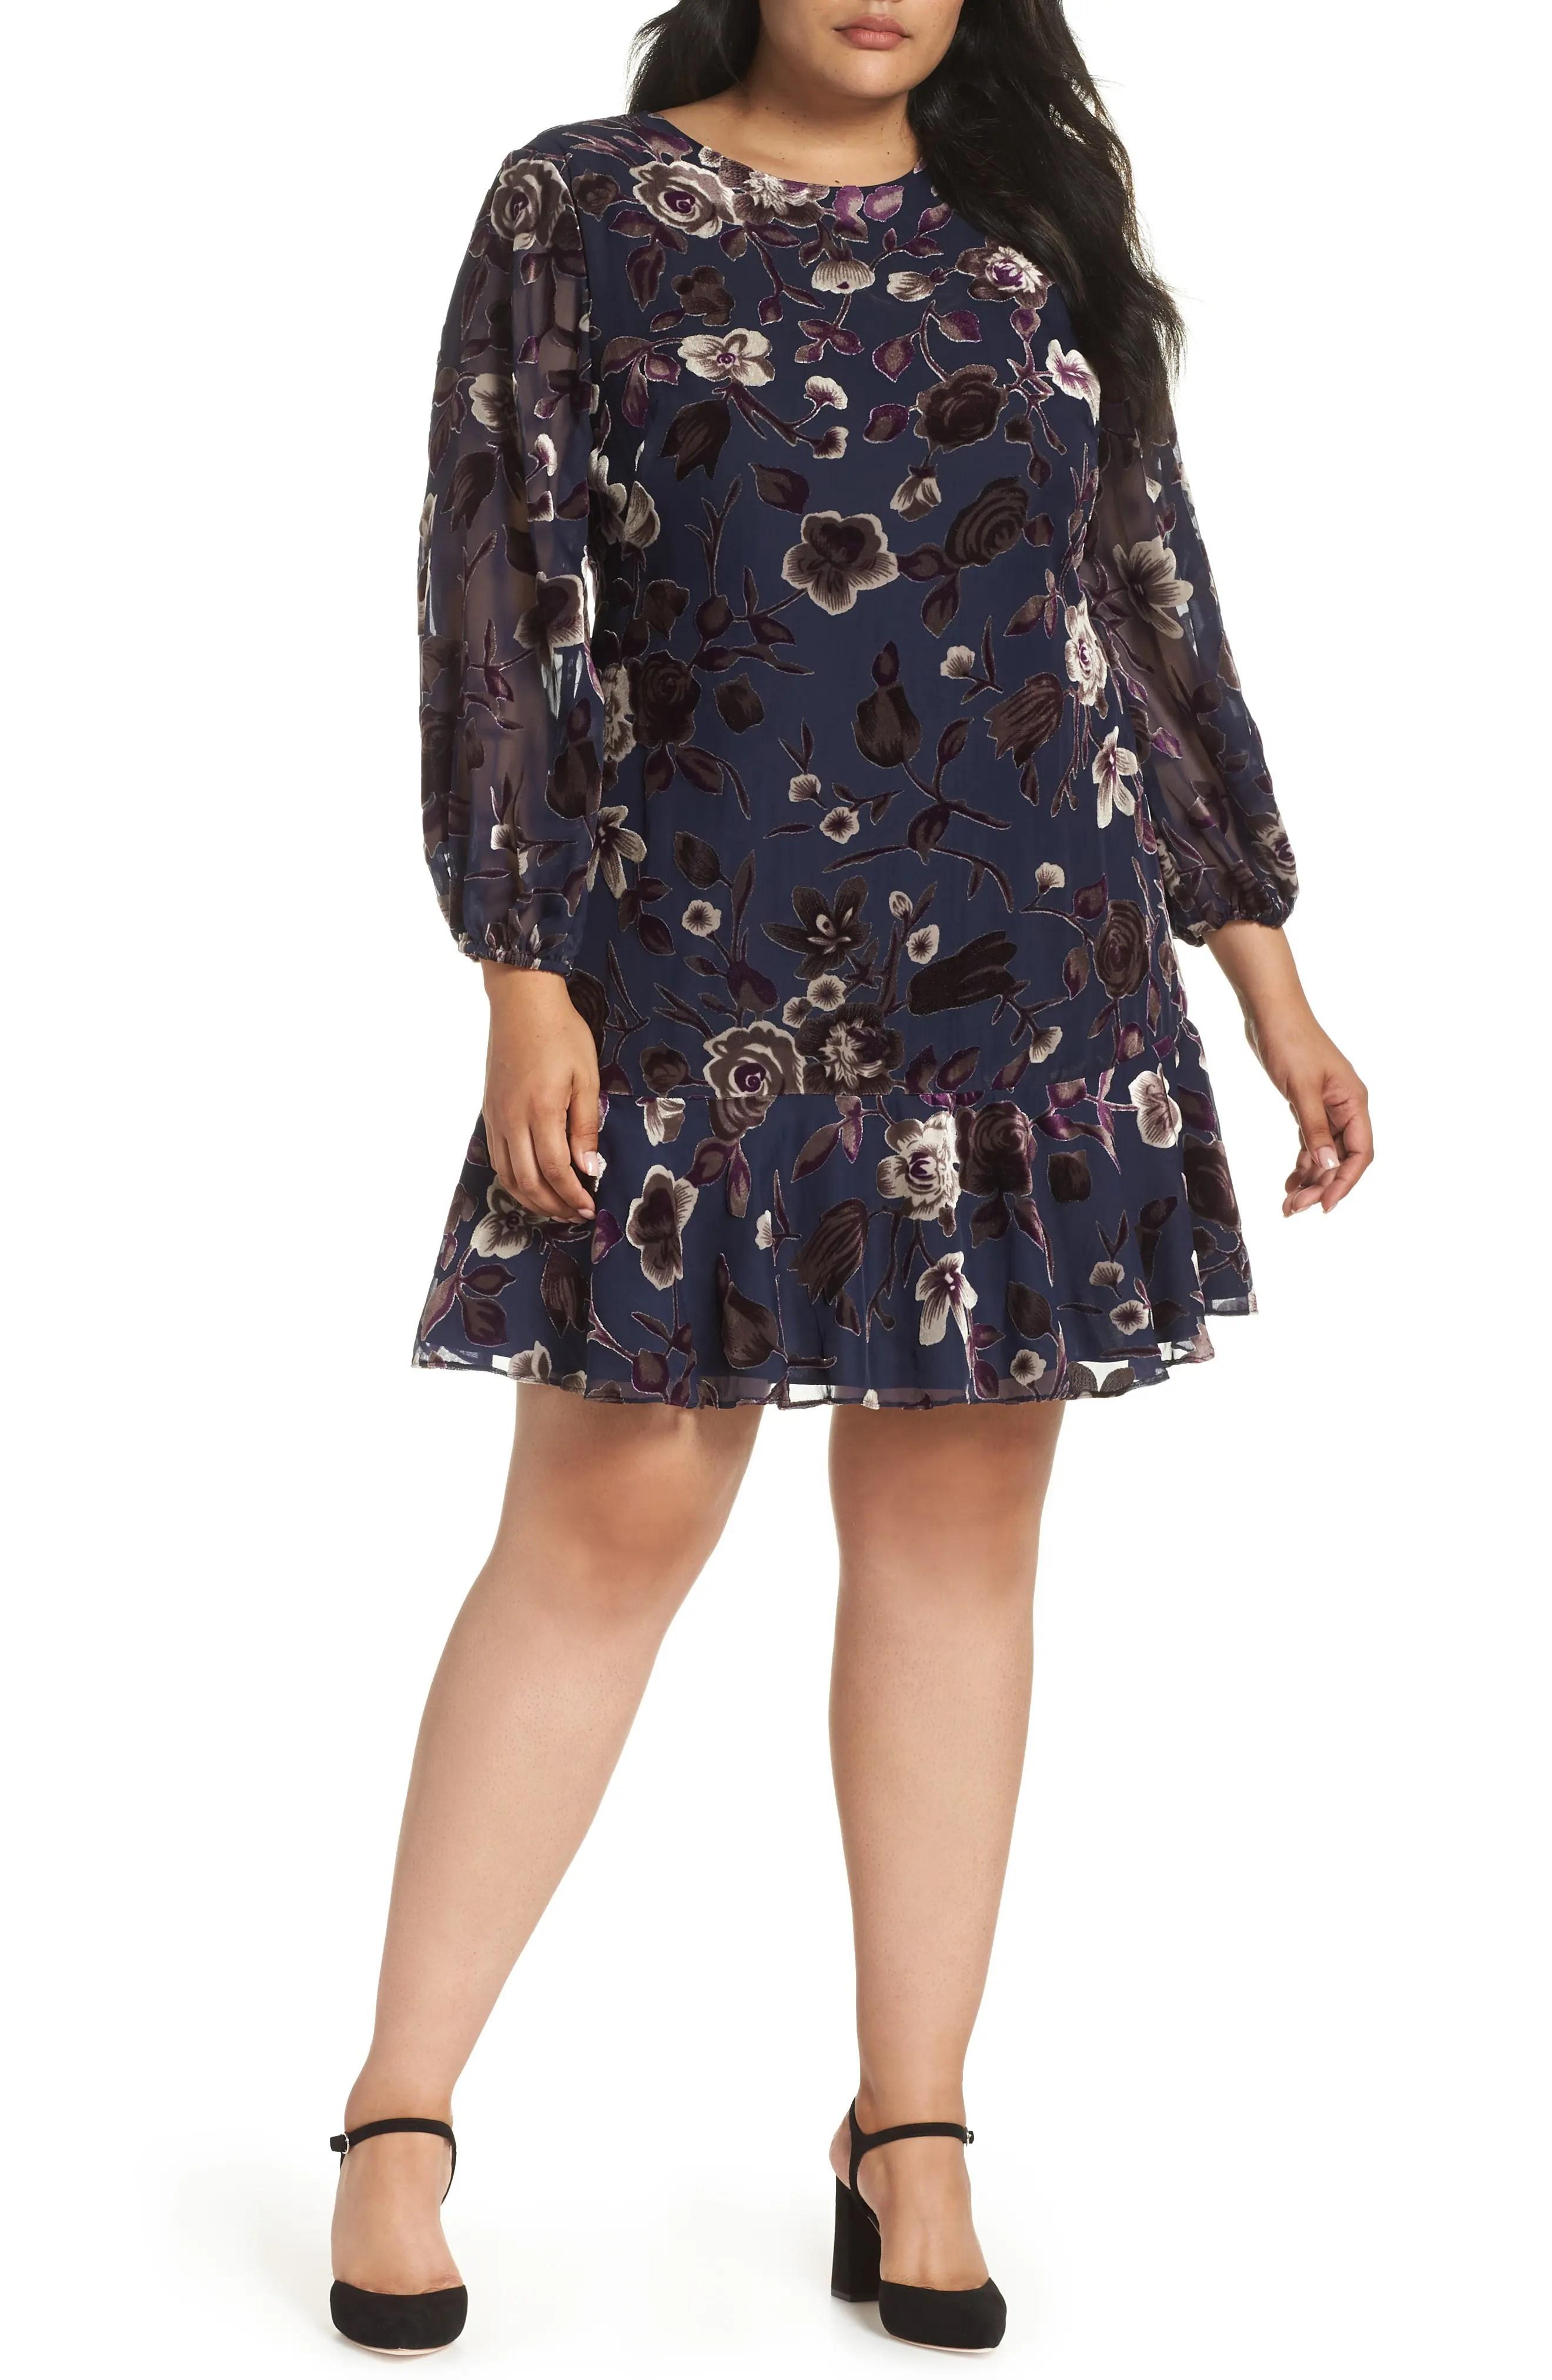 Eliza  ruffle hem shift dress plus size also women   dresses nordstrom rh shoprdstrom